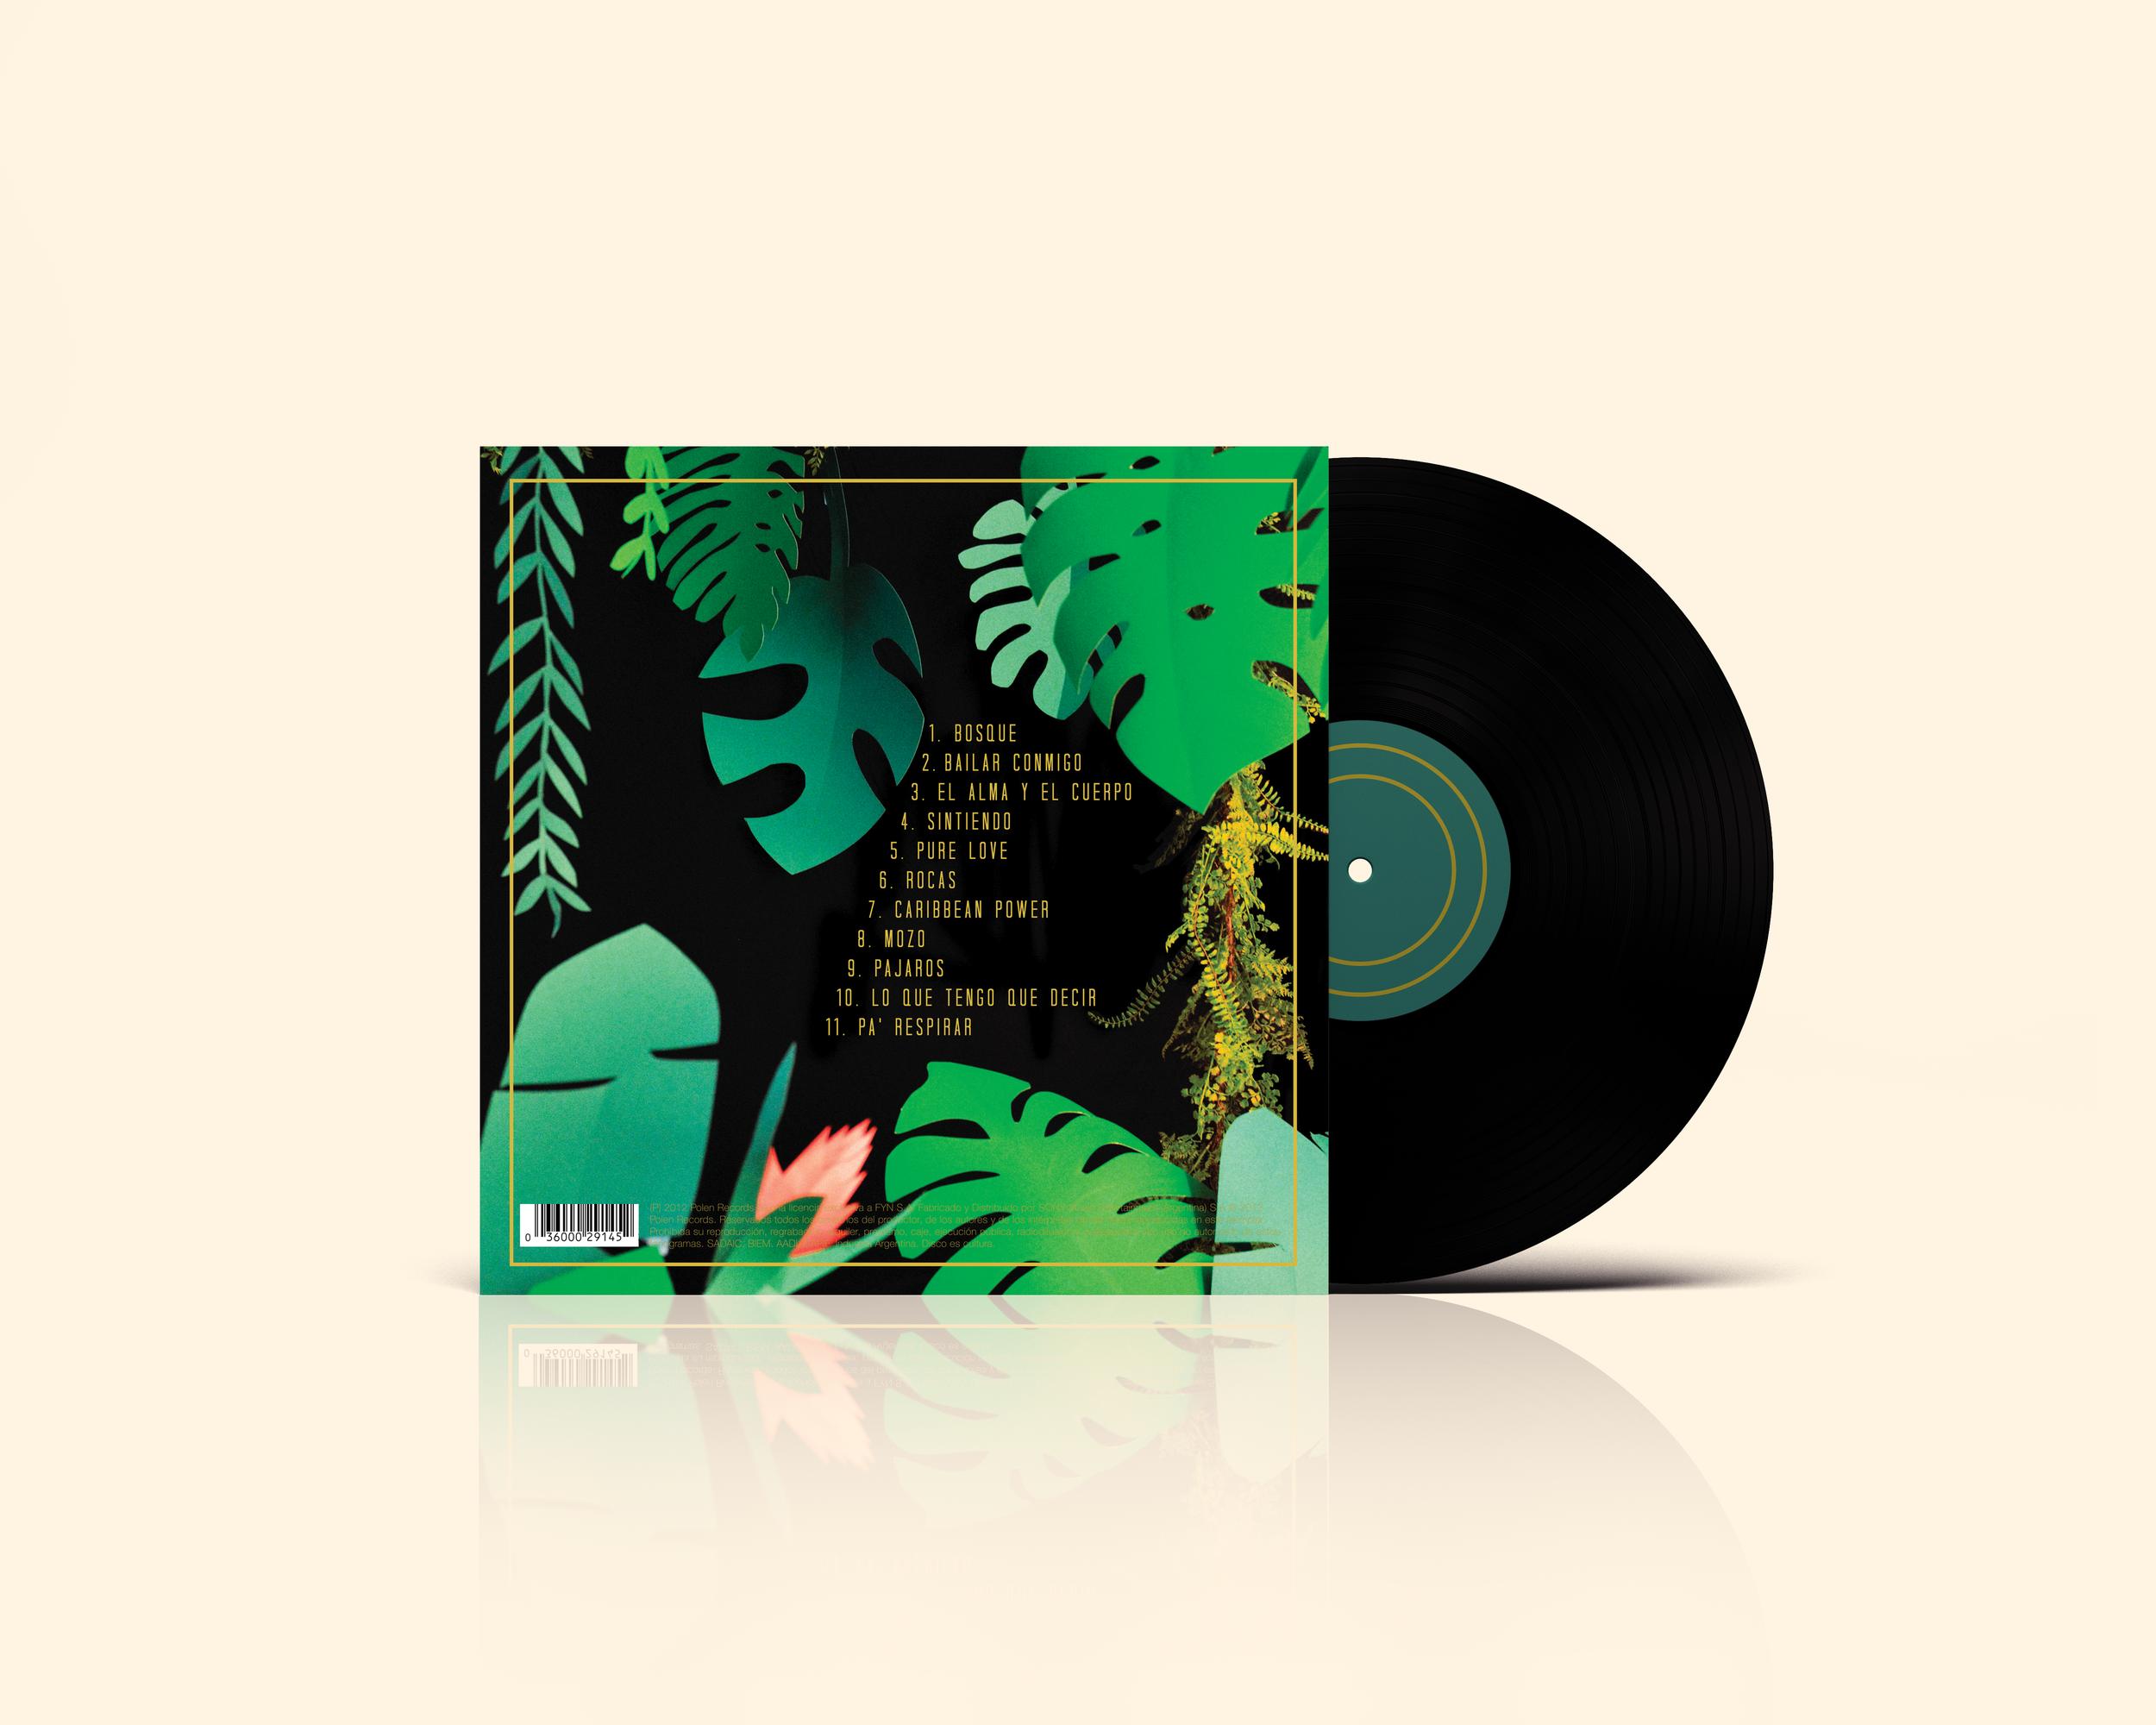 Vinyl Record Mockup back.png